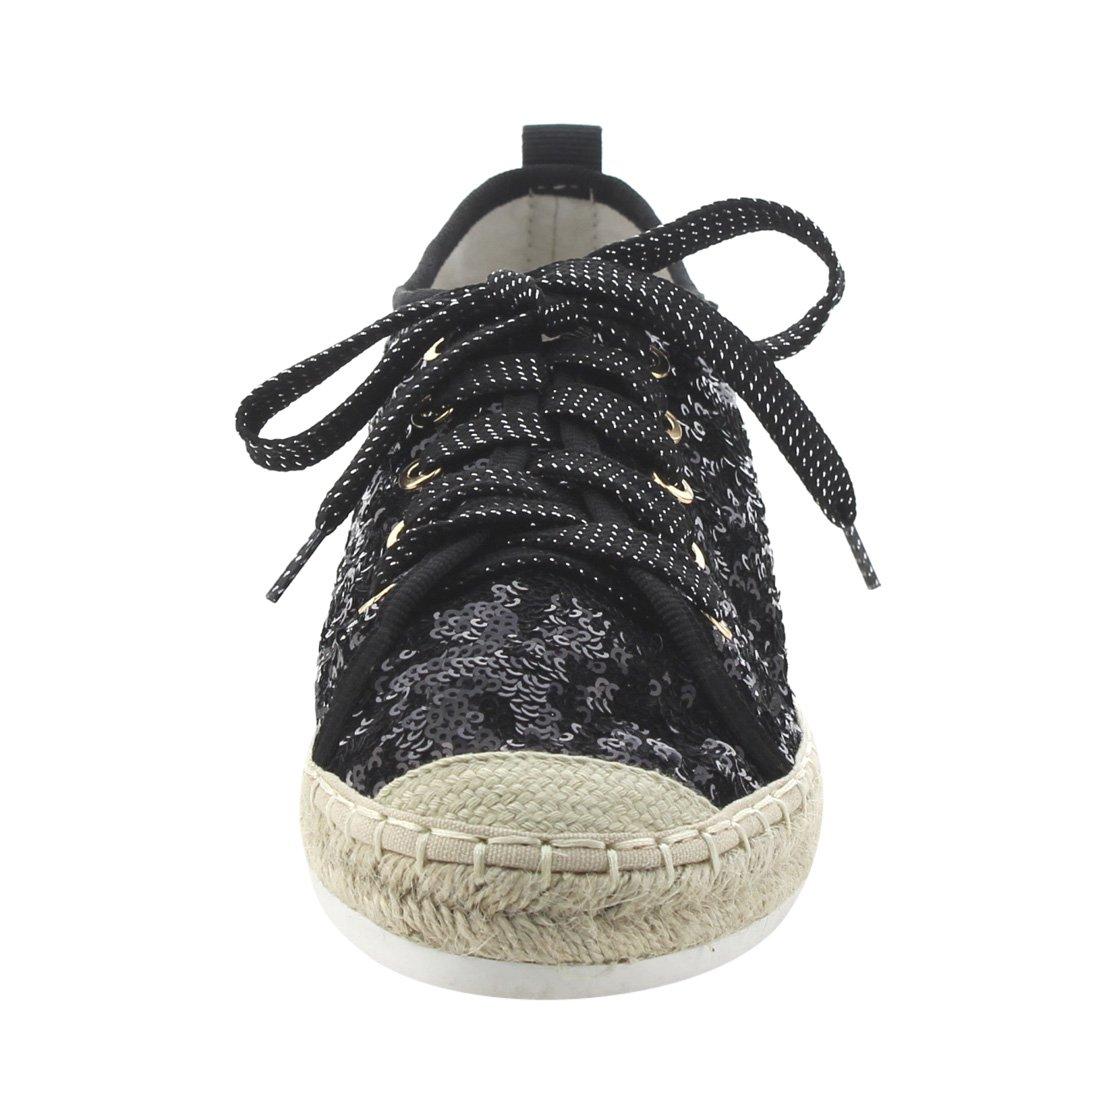 Bonnibel FJ64 Womens Sparking Glitter Espadrilles Lace Up Sneakers